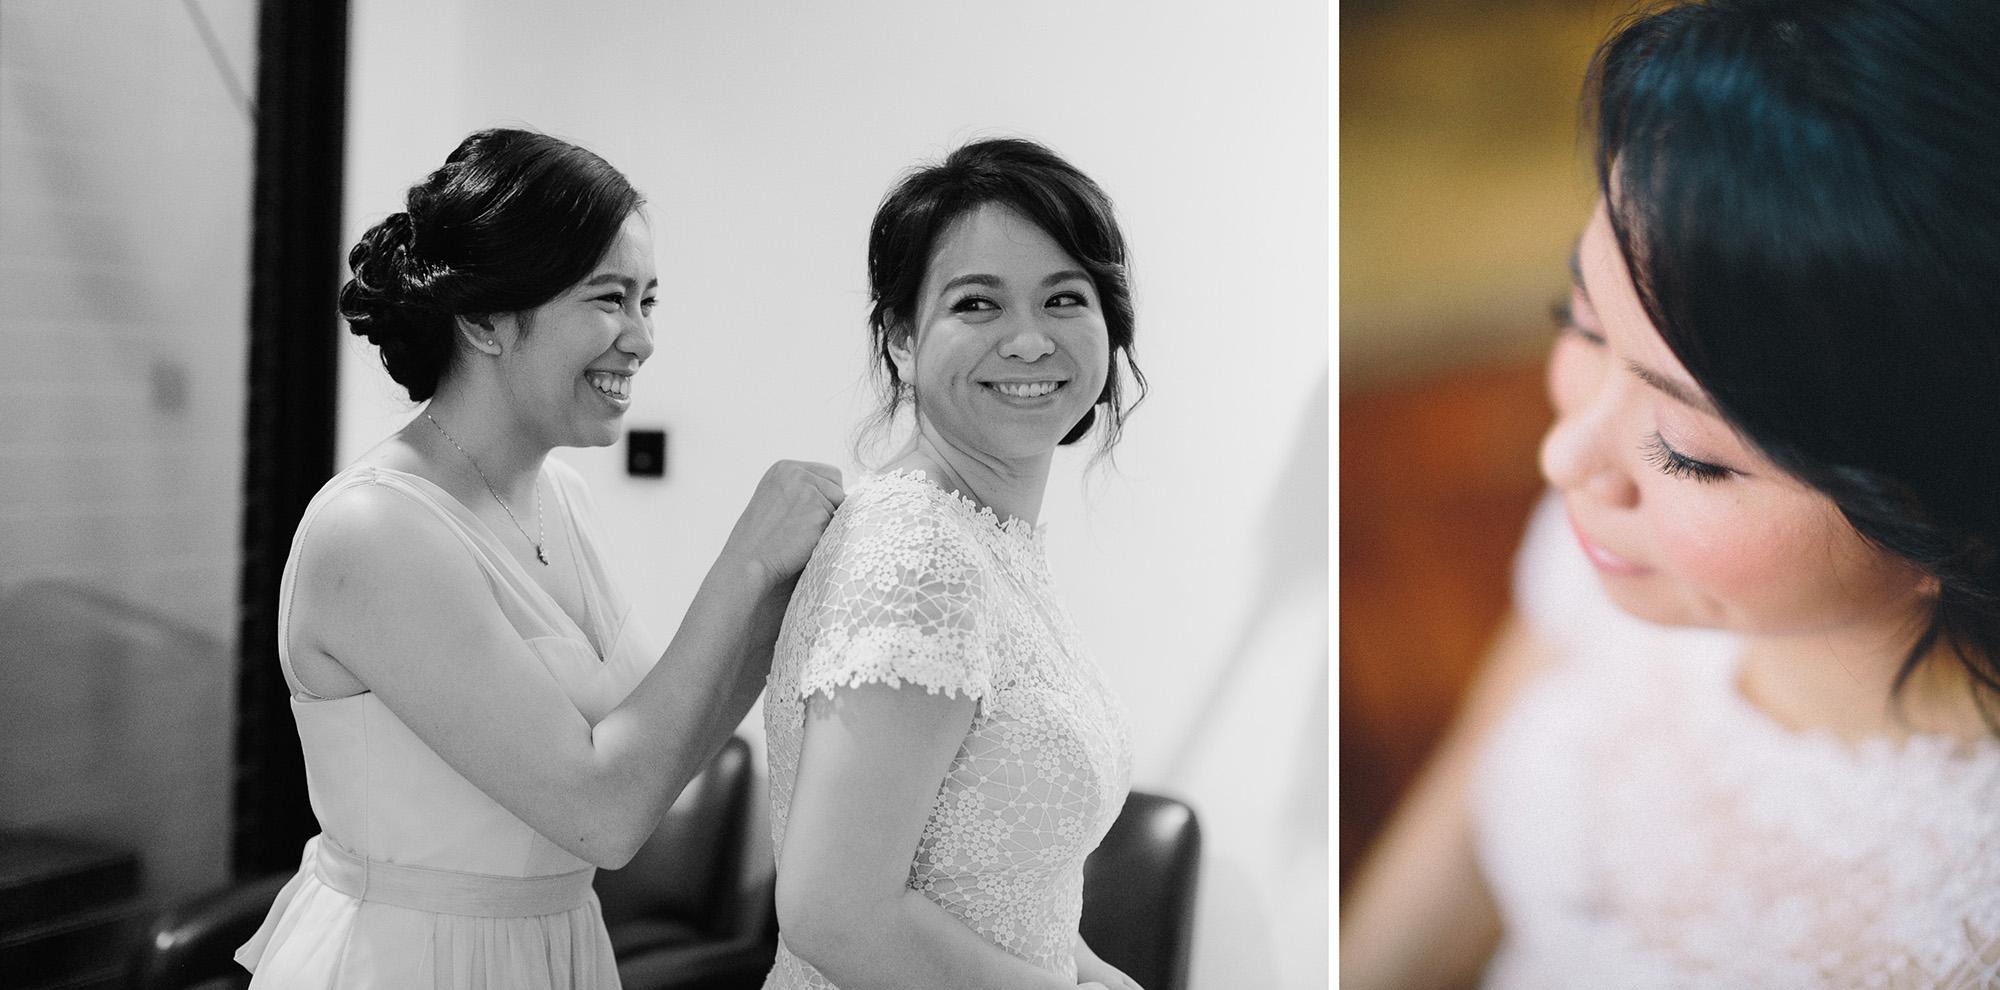 5-hellojanelee-sam grace-malaysia-wedding-day